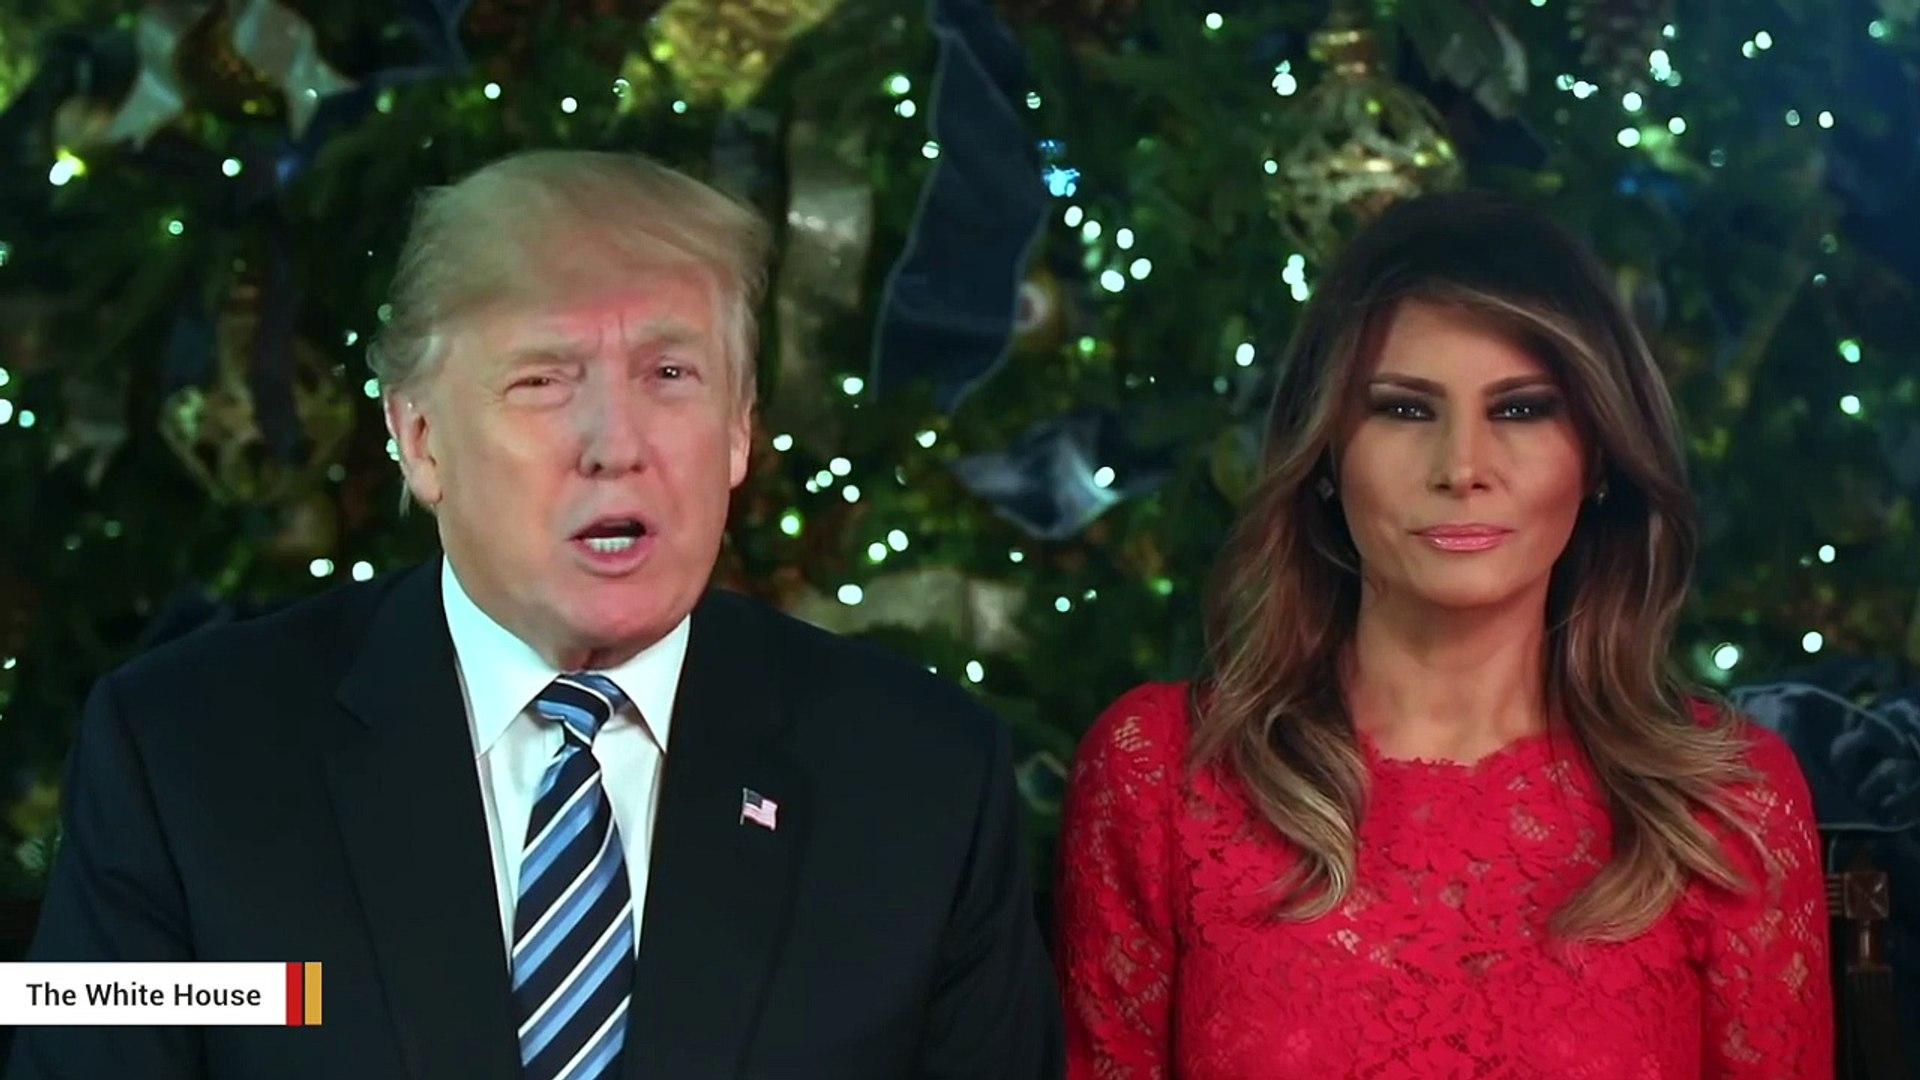 Melania Trump Shares Christmas Selfie On Twitter